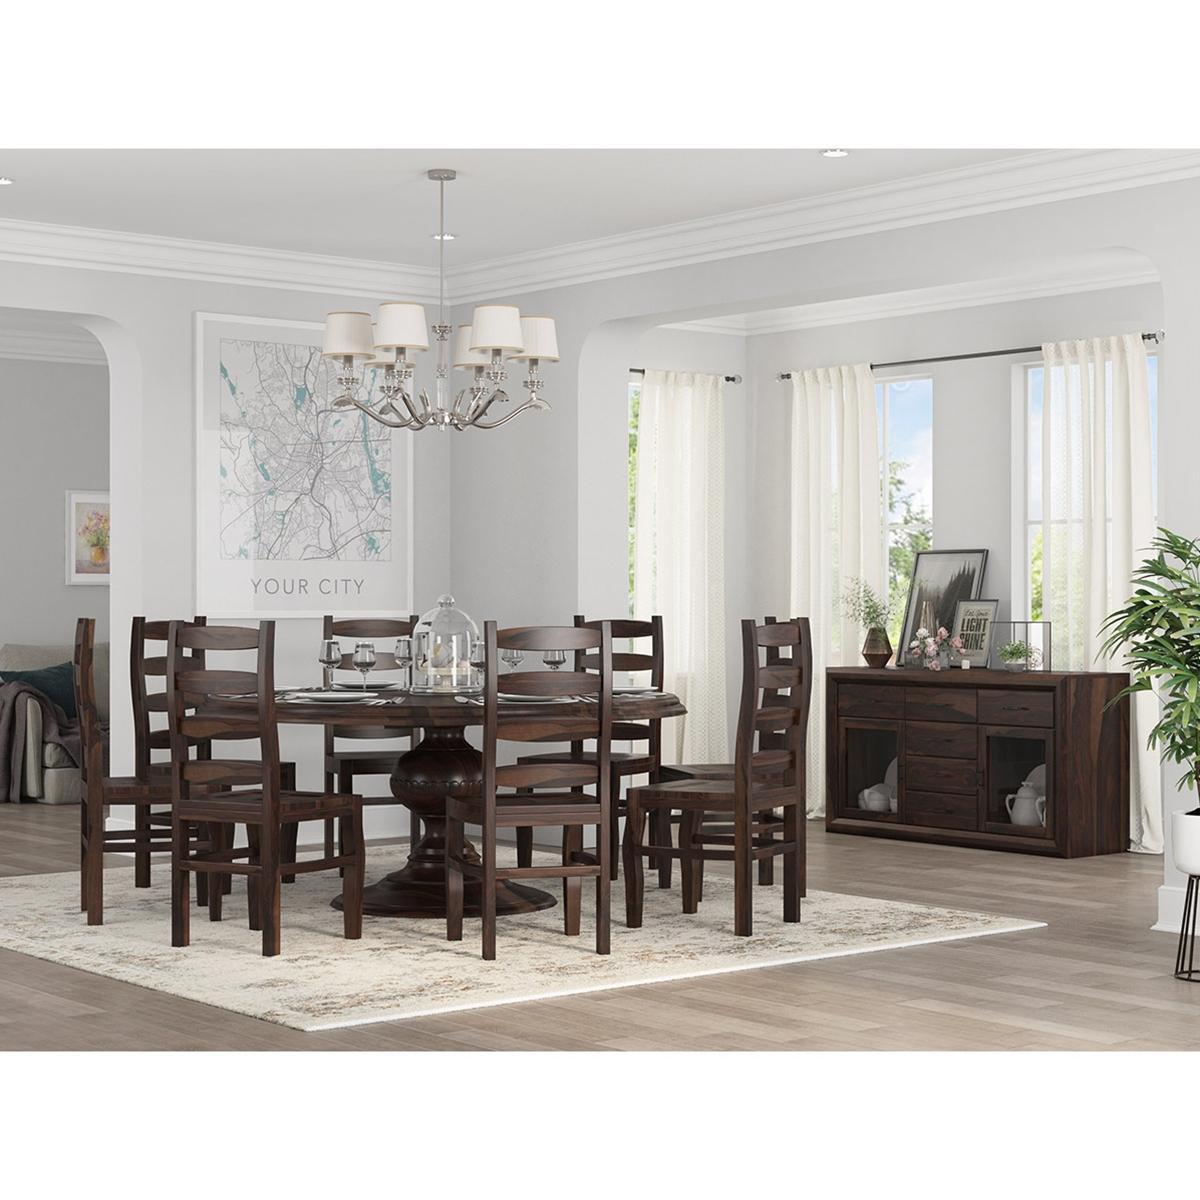 minsk rustic traditional rosewood 8 piece dining room set. Black Bedroom Furniture Sets. Home Design Ideas